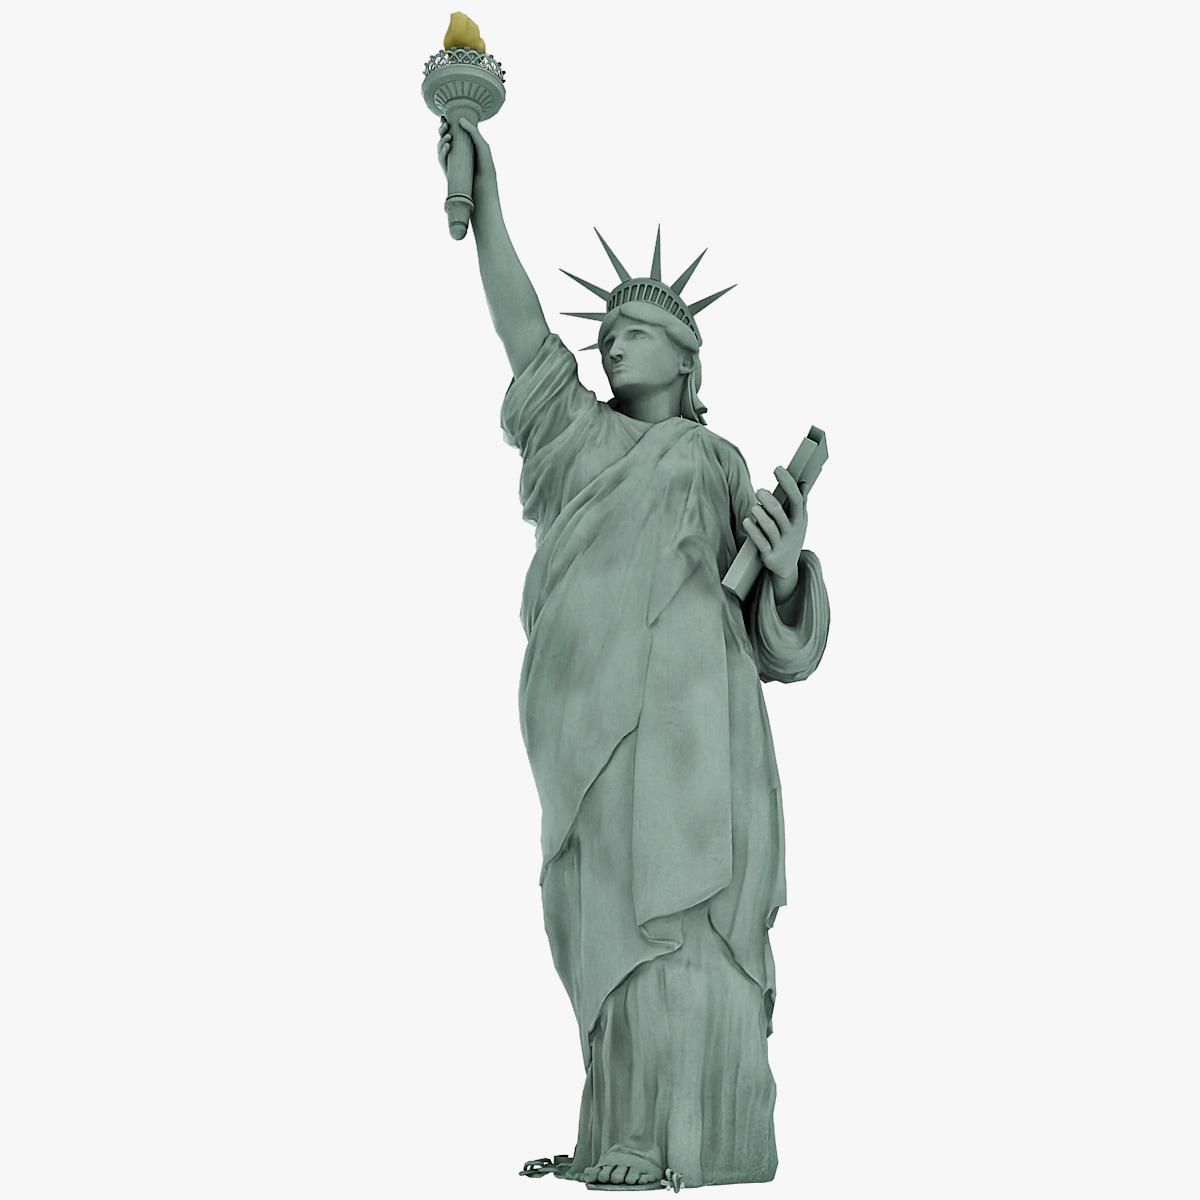 Statue_of_Liberty_v2_000.jpg